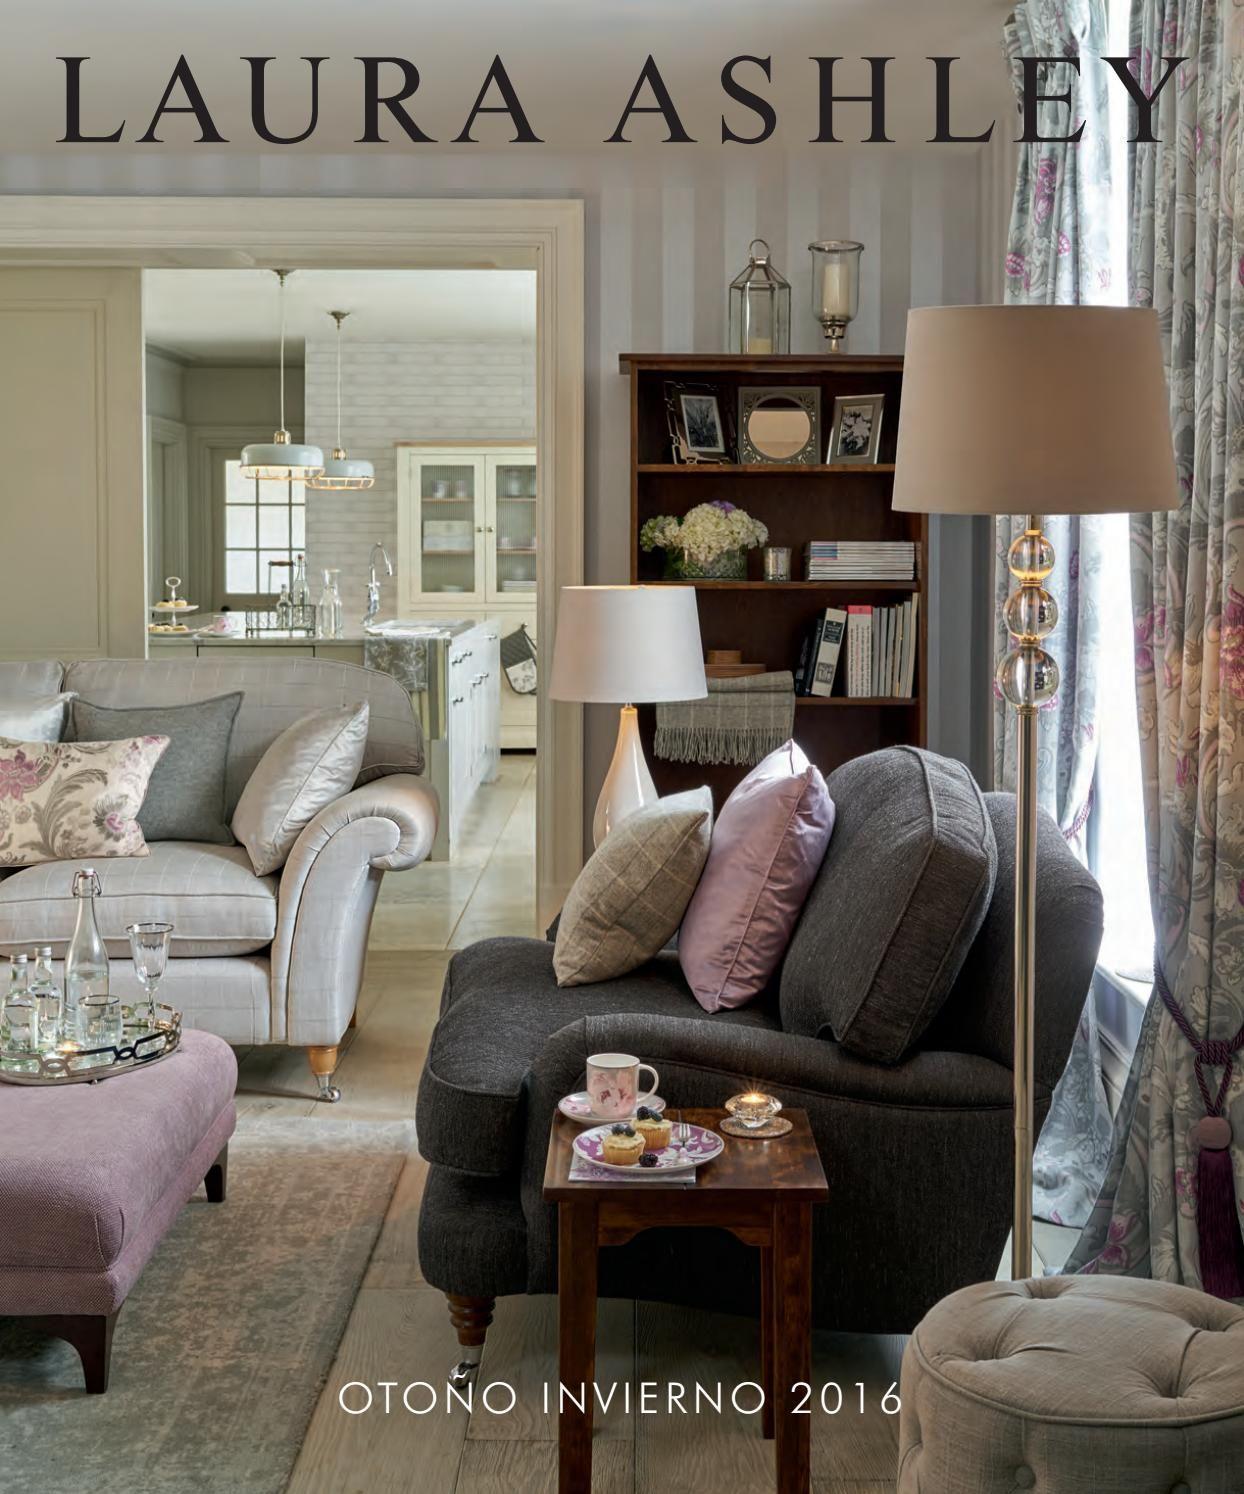 Laura ashley decoraci n oto o invierno 2016 home deco - Muebles laura ashley ...